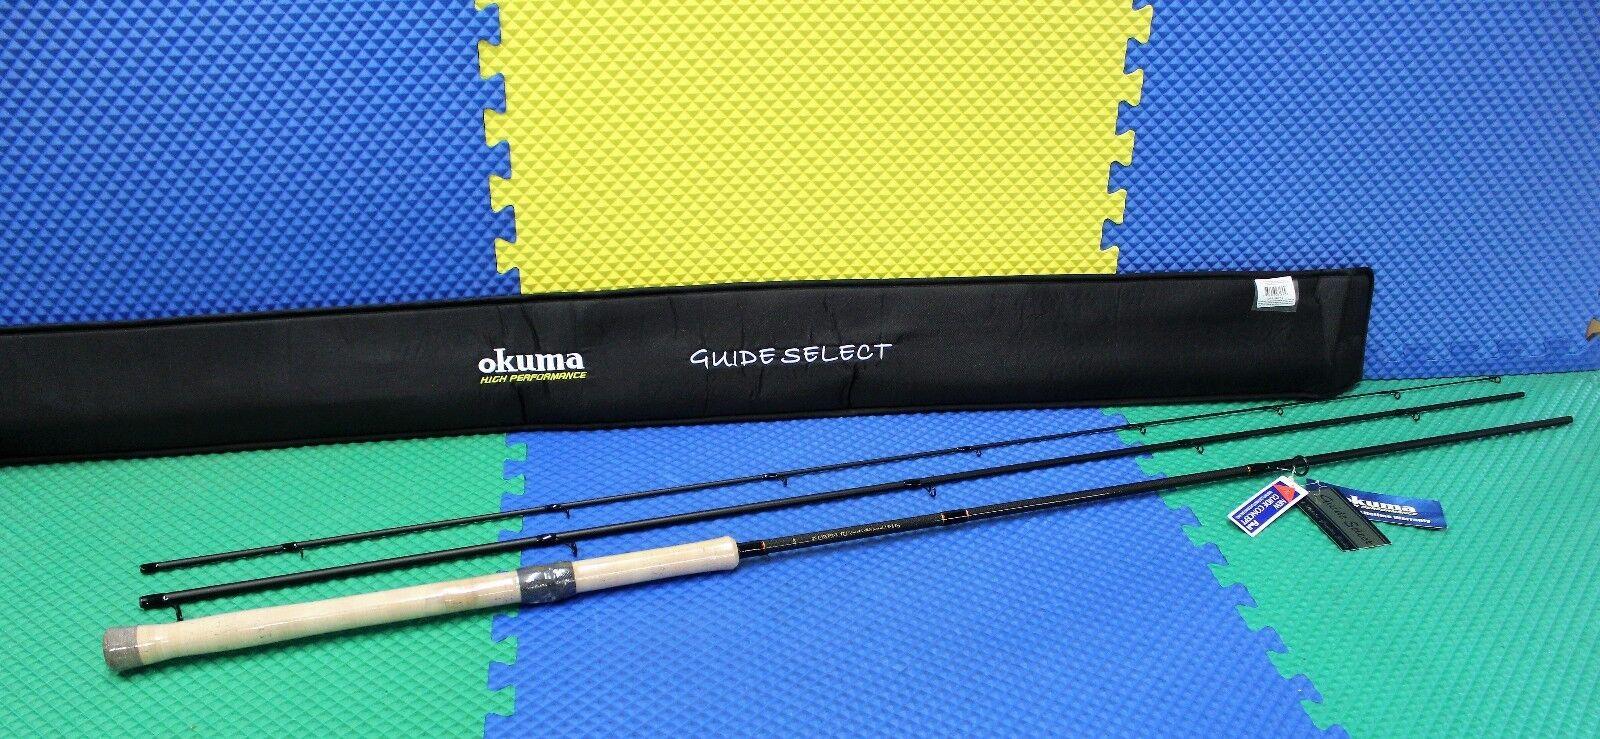 Okuma Guide Select Float Rod 13' 6   Medium Taper IM-8 Graphite 3PC GS-S-1363FR-2  online fashion shopping